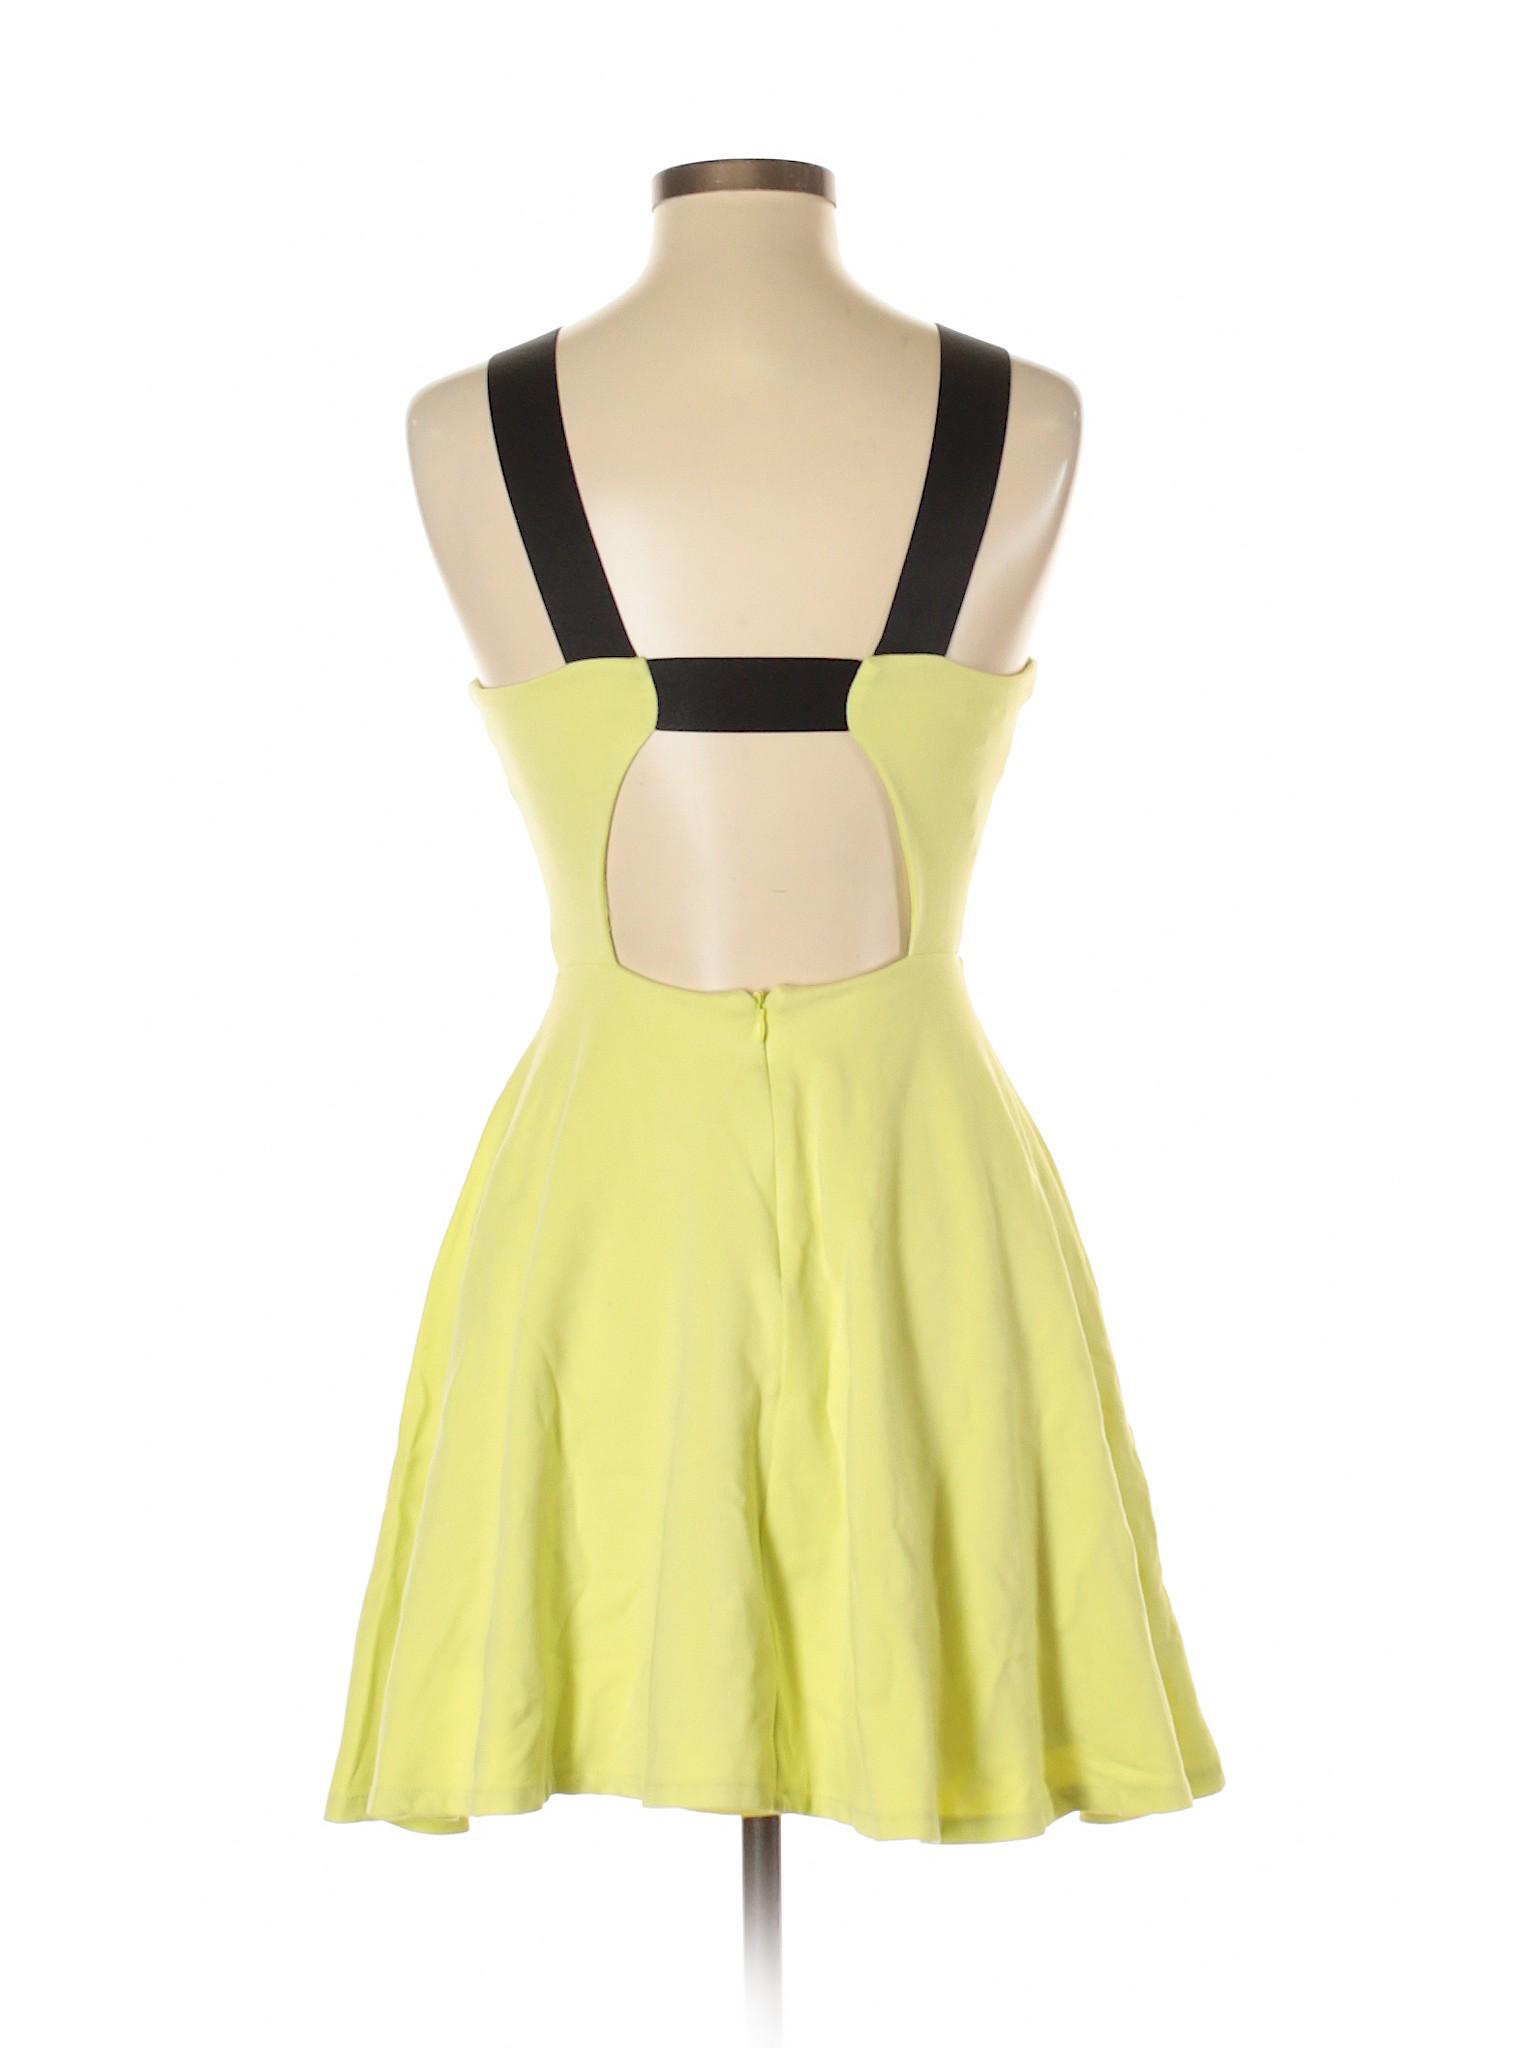 Boutique Dress Casual winter Bebe Boutique winter YqxRBFC